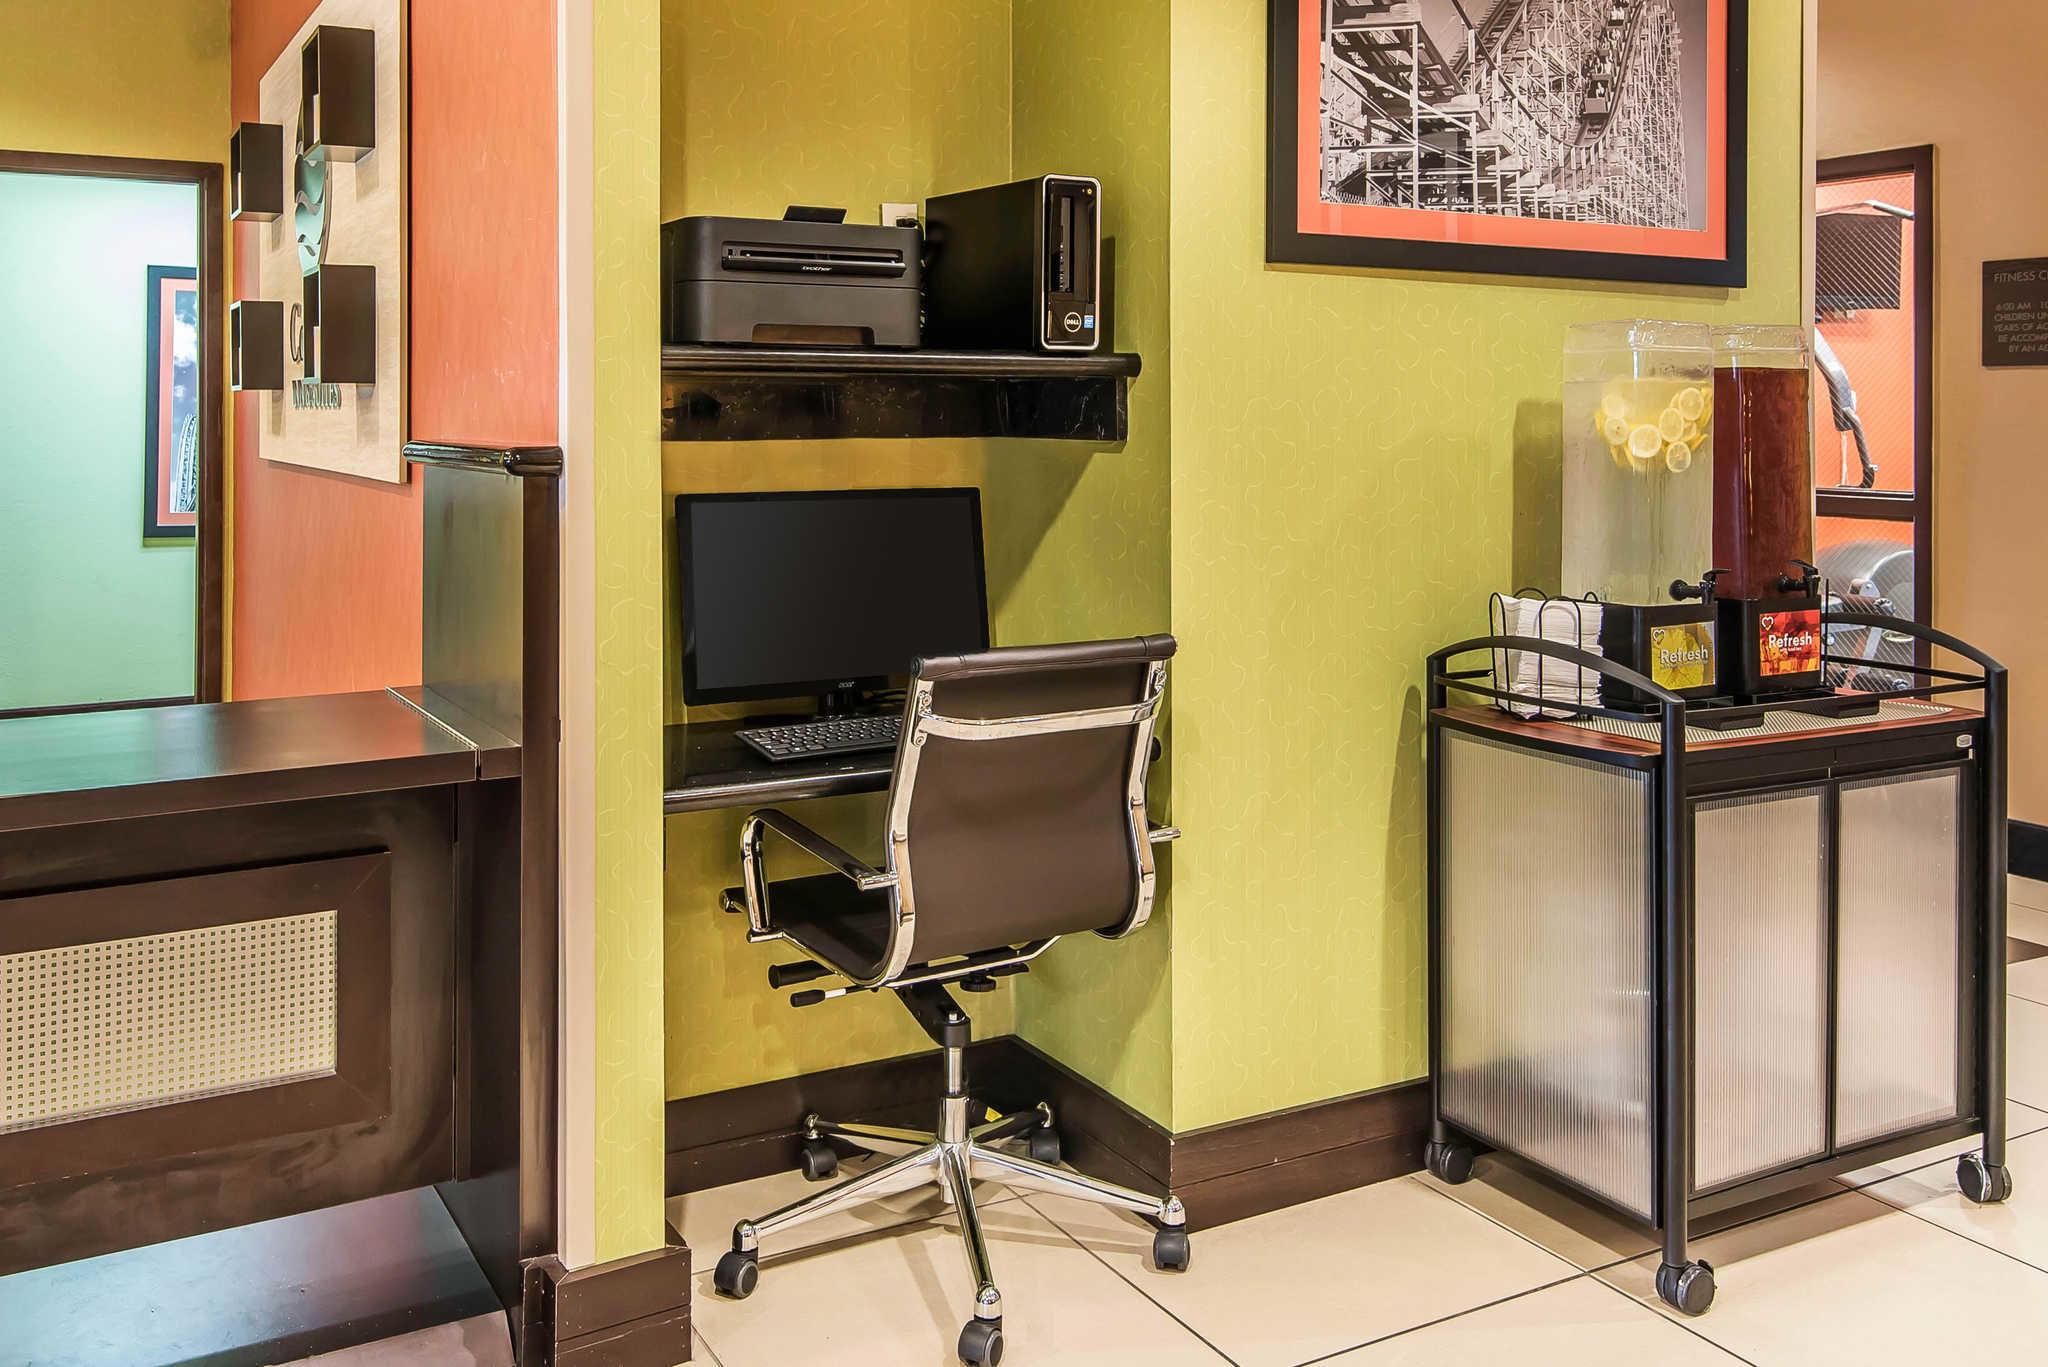 Comfort Inn & Suites Kansas City - Northeast image 30